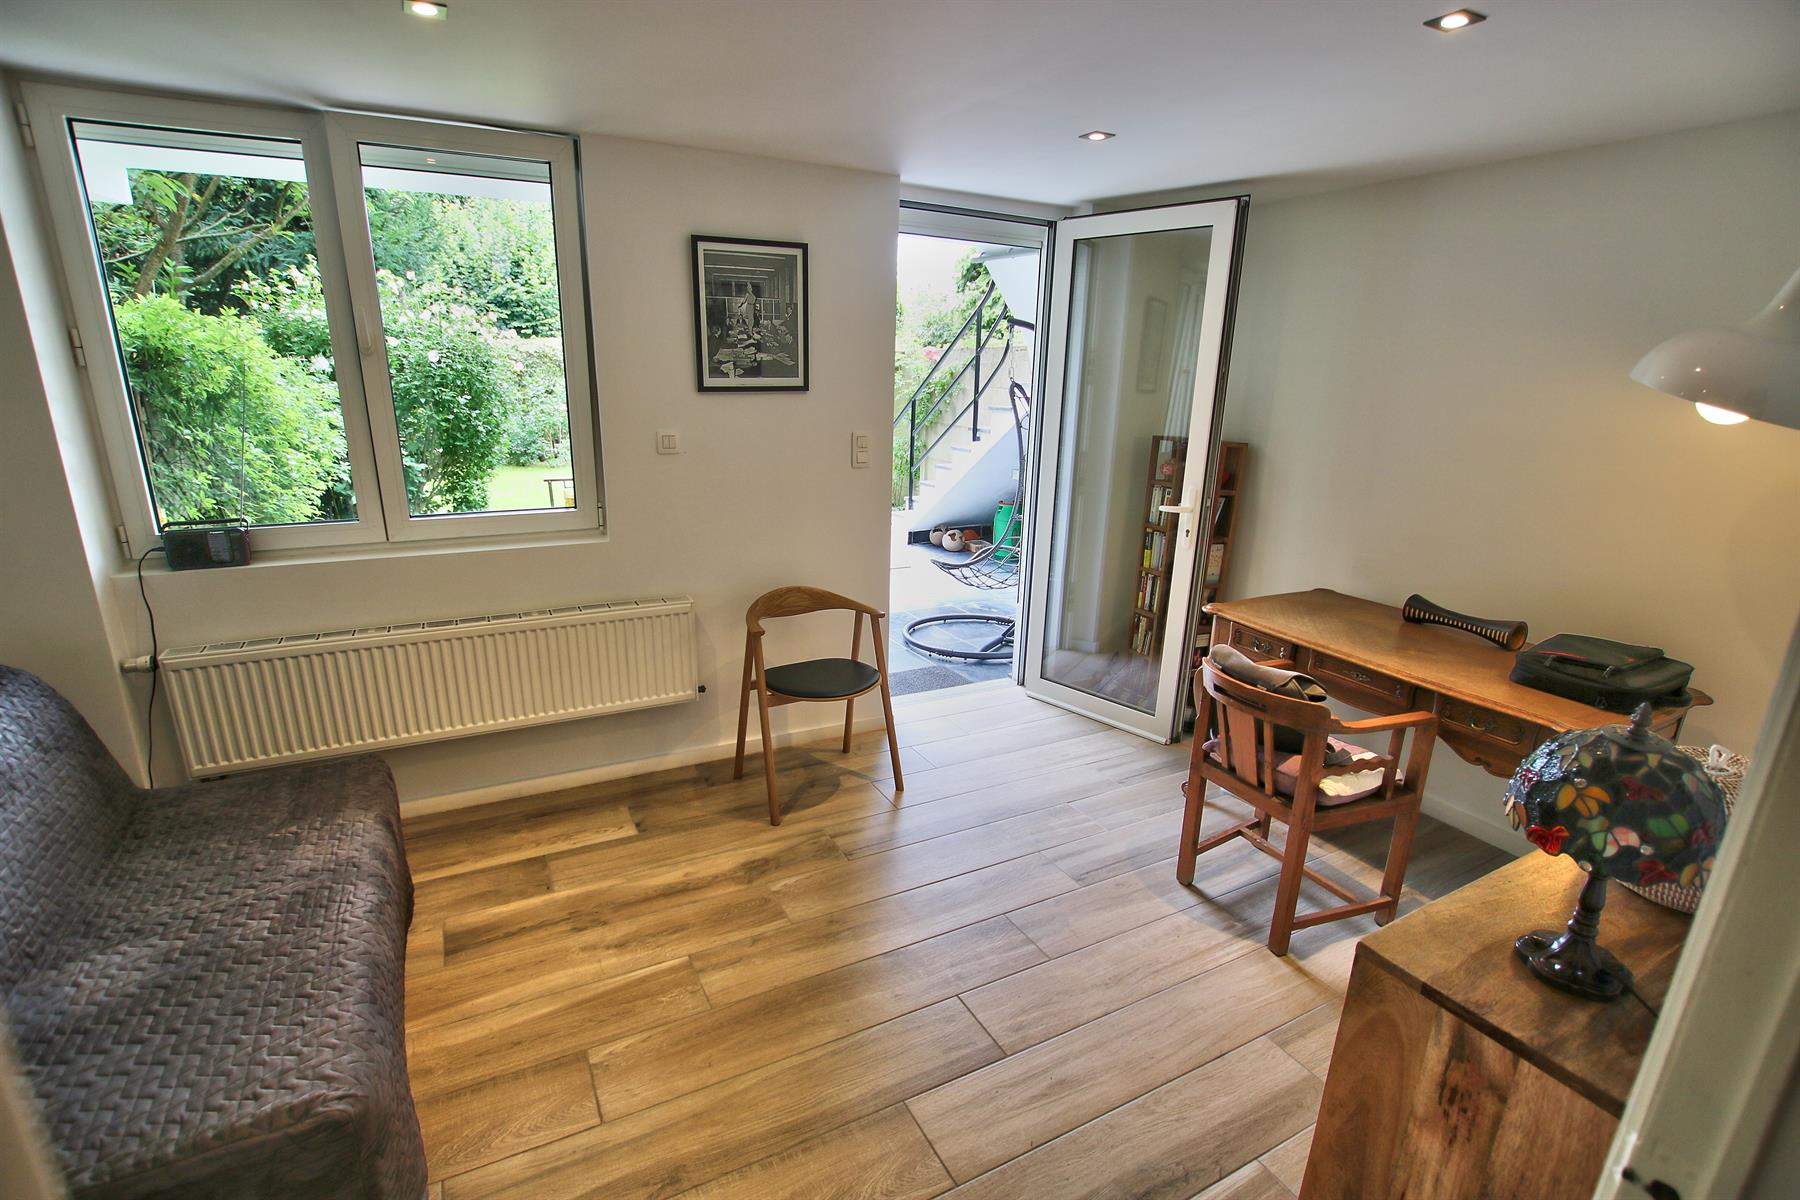 Maison - Etterbeek - #4454540-23